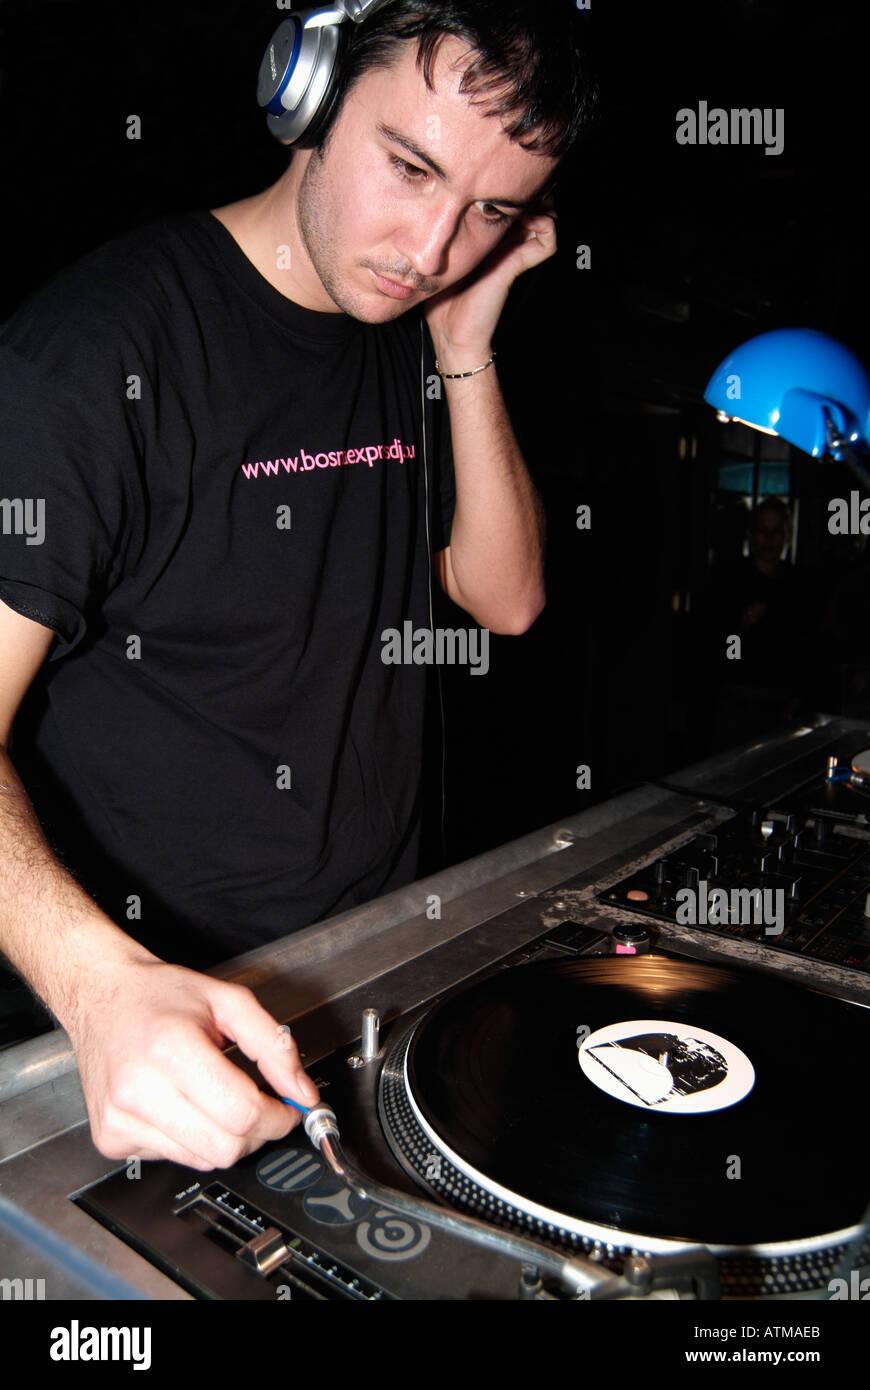 Club DJ Behind the Decks in a Nightclub - Stock Image